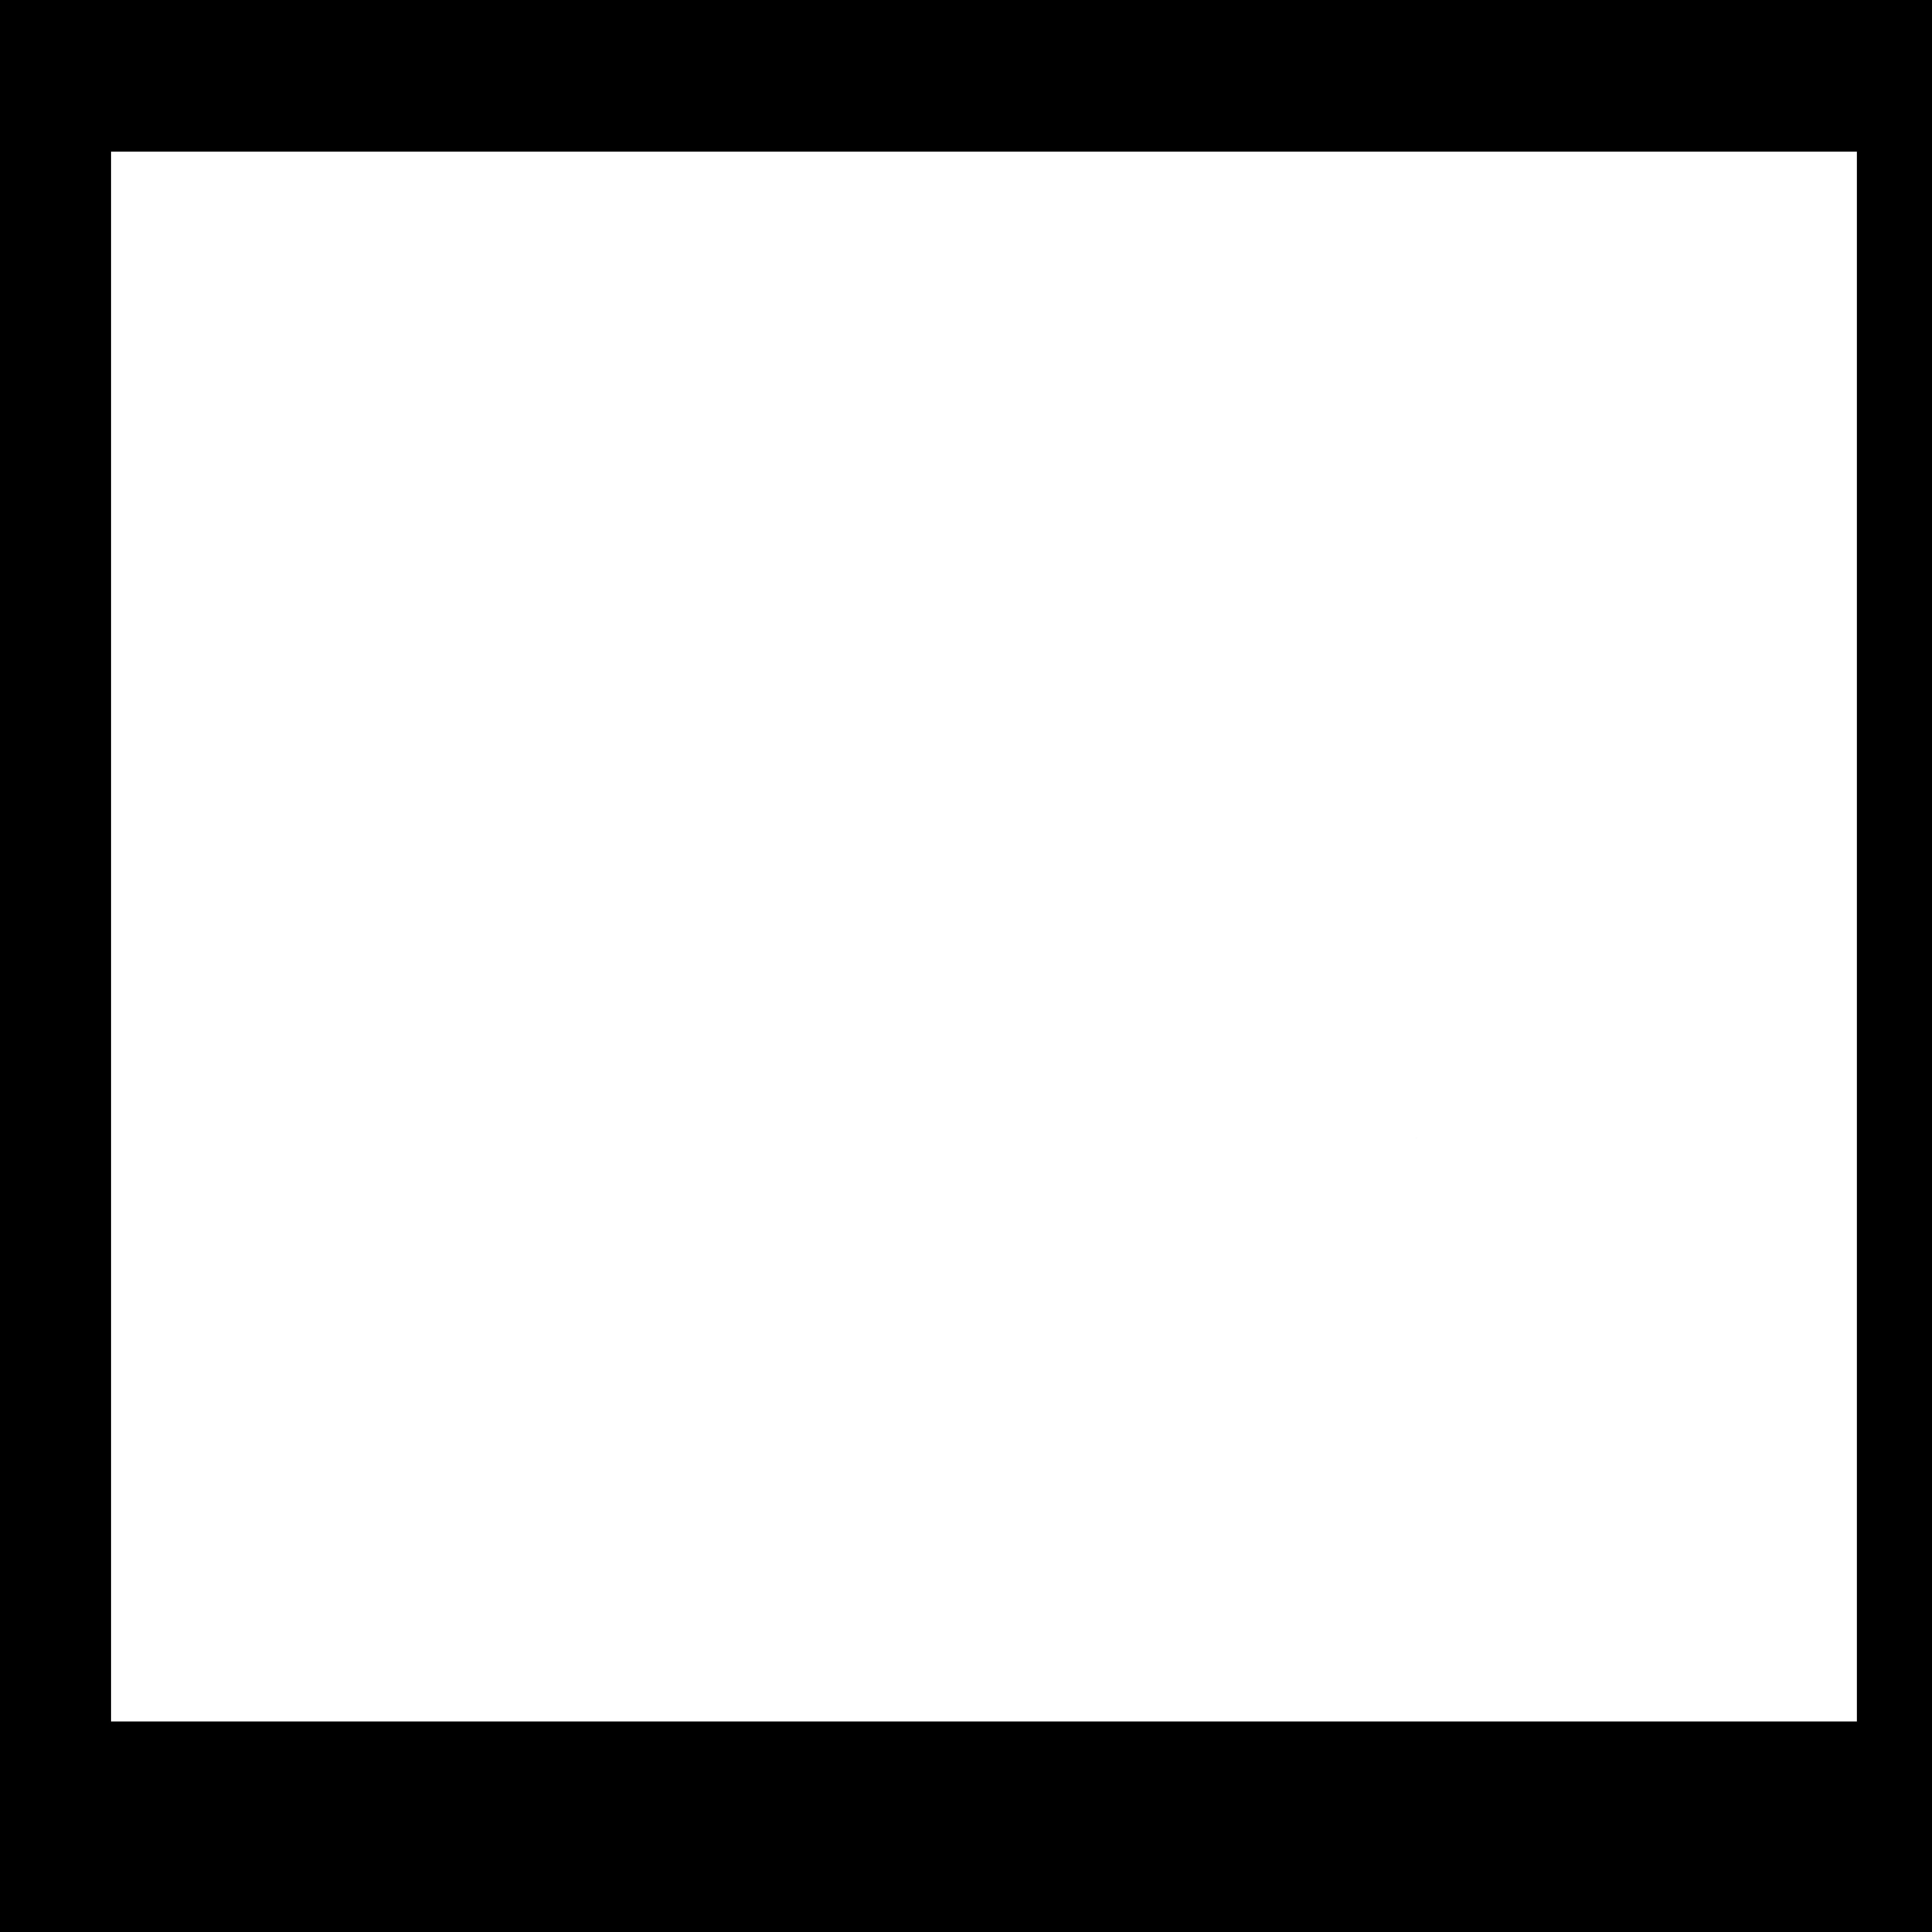 Designed by Devon Cornelius